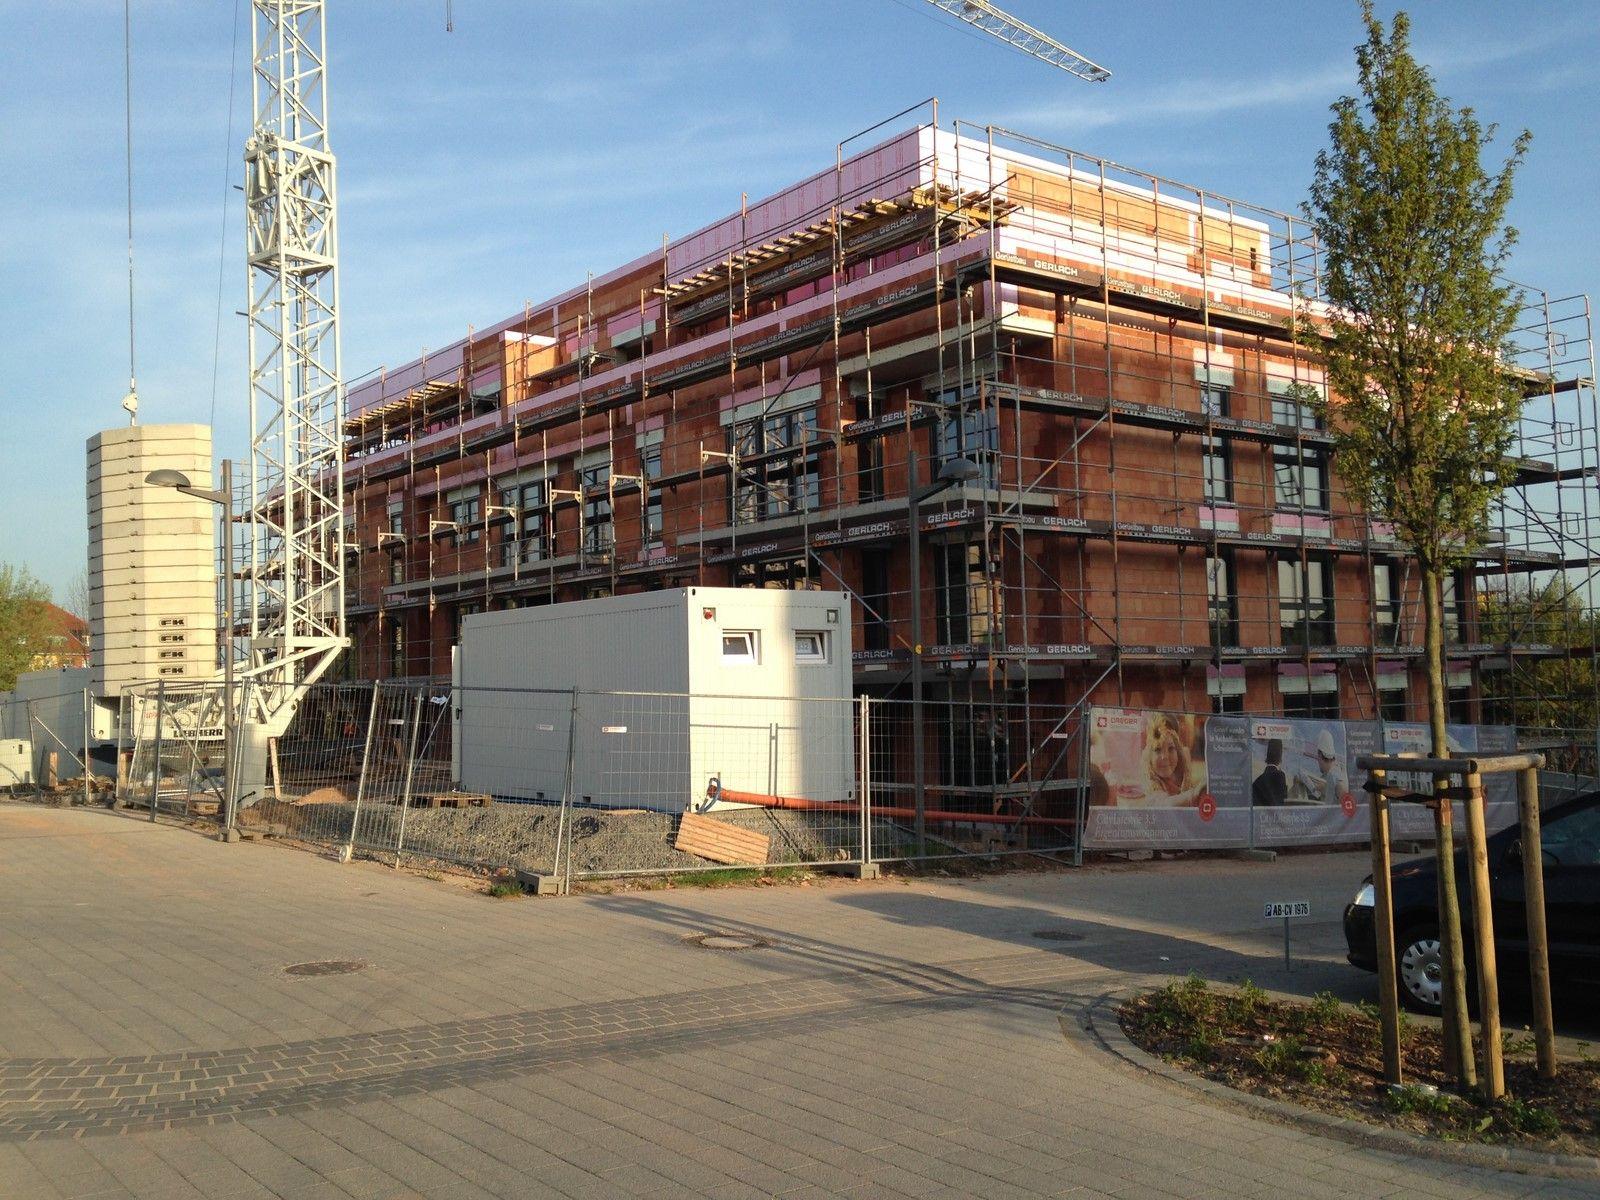 Bautenstand 16.04.2015 Aschaffenburg, Baubeginn, Bau